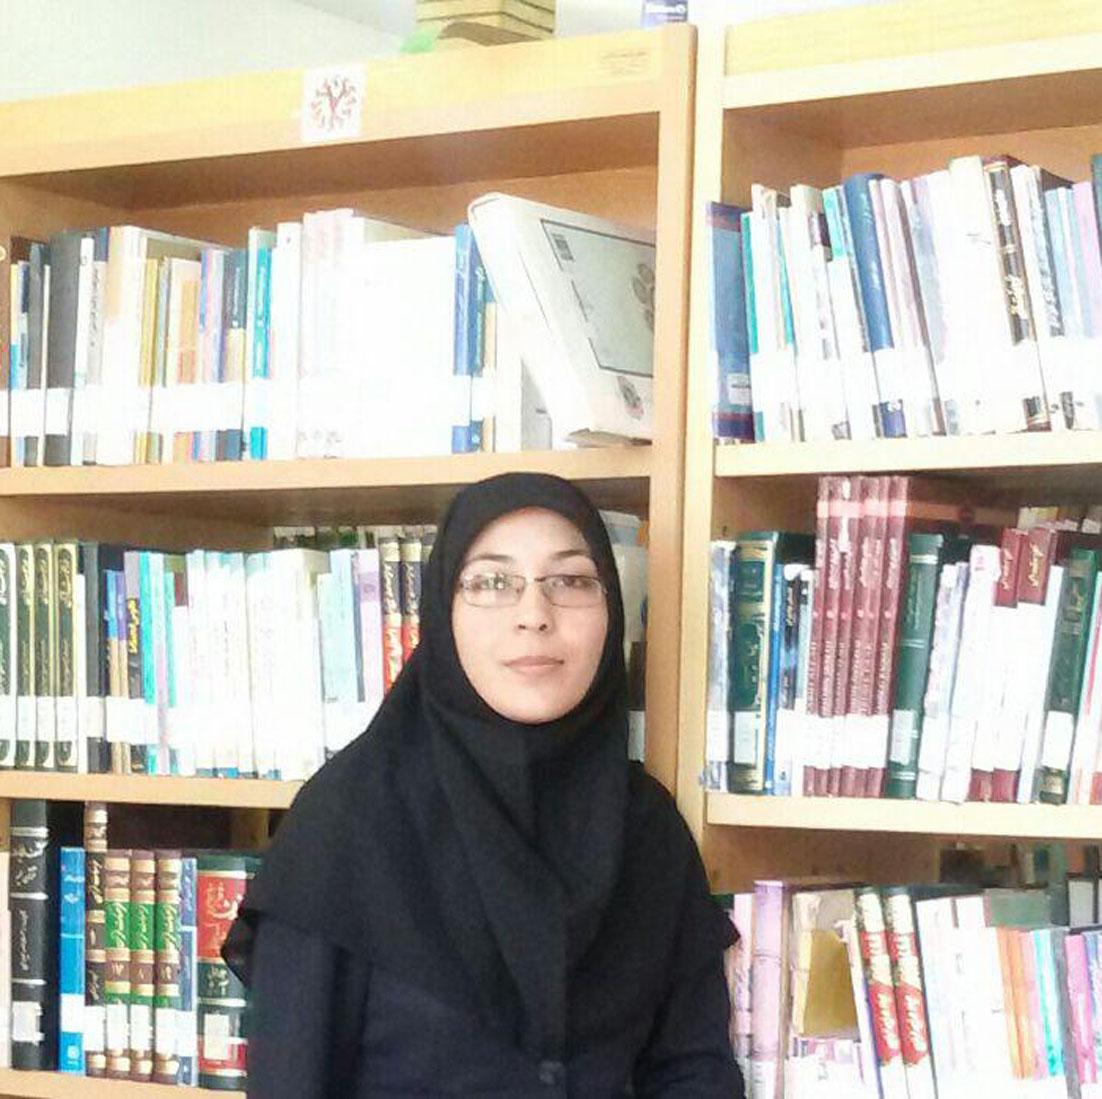 MahnazKarimzadeh-lib2mag